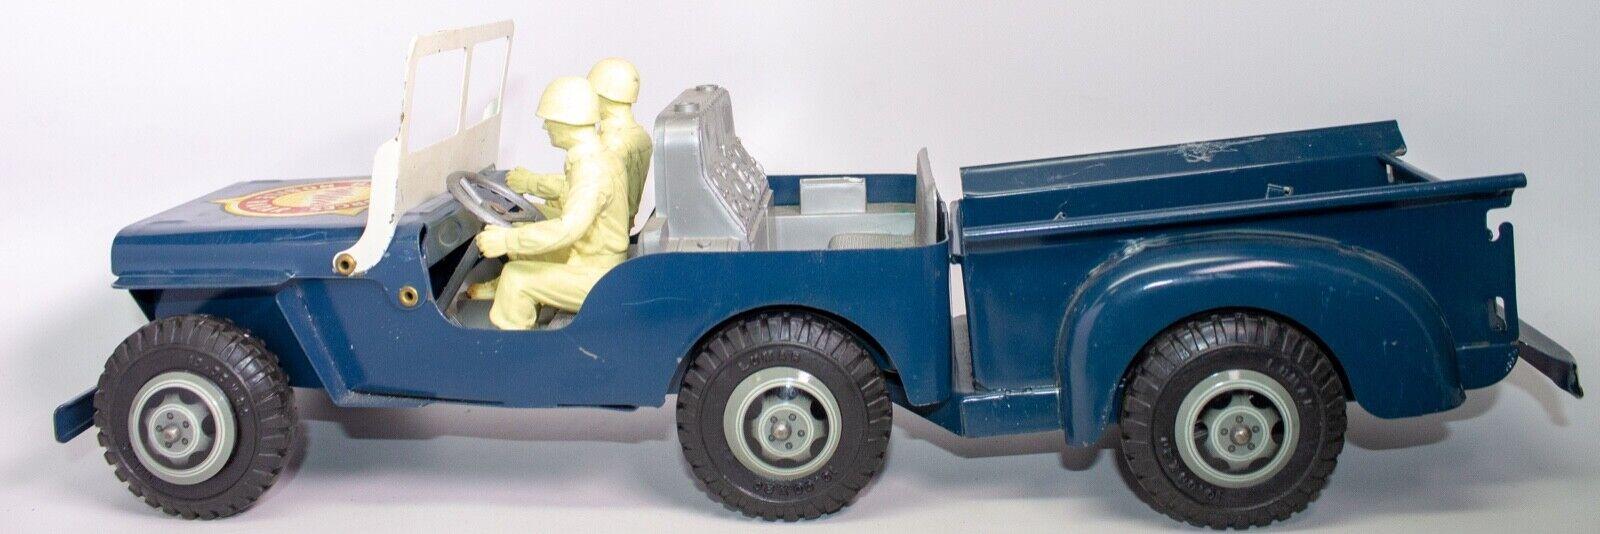 Vintage Marx Willys Jeep   U.S.Bewaffnet Forces Mobile Radar W   Soldaten, Lkw